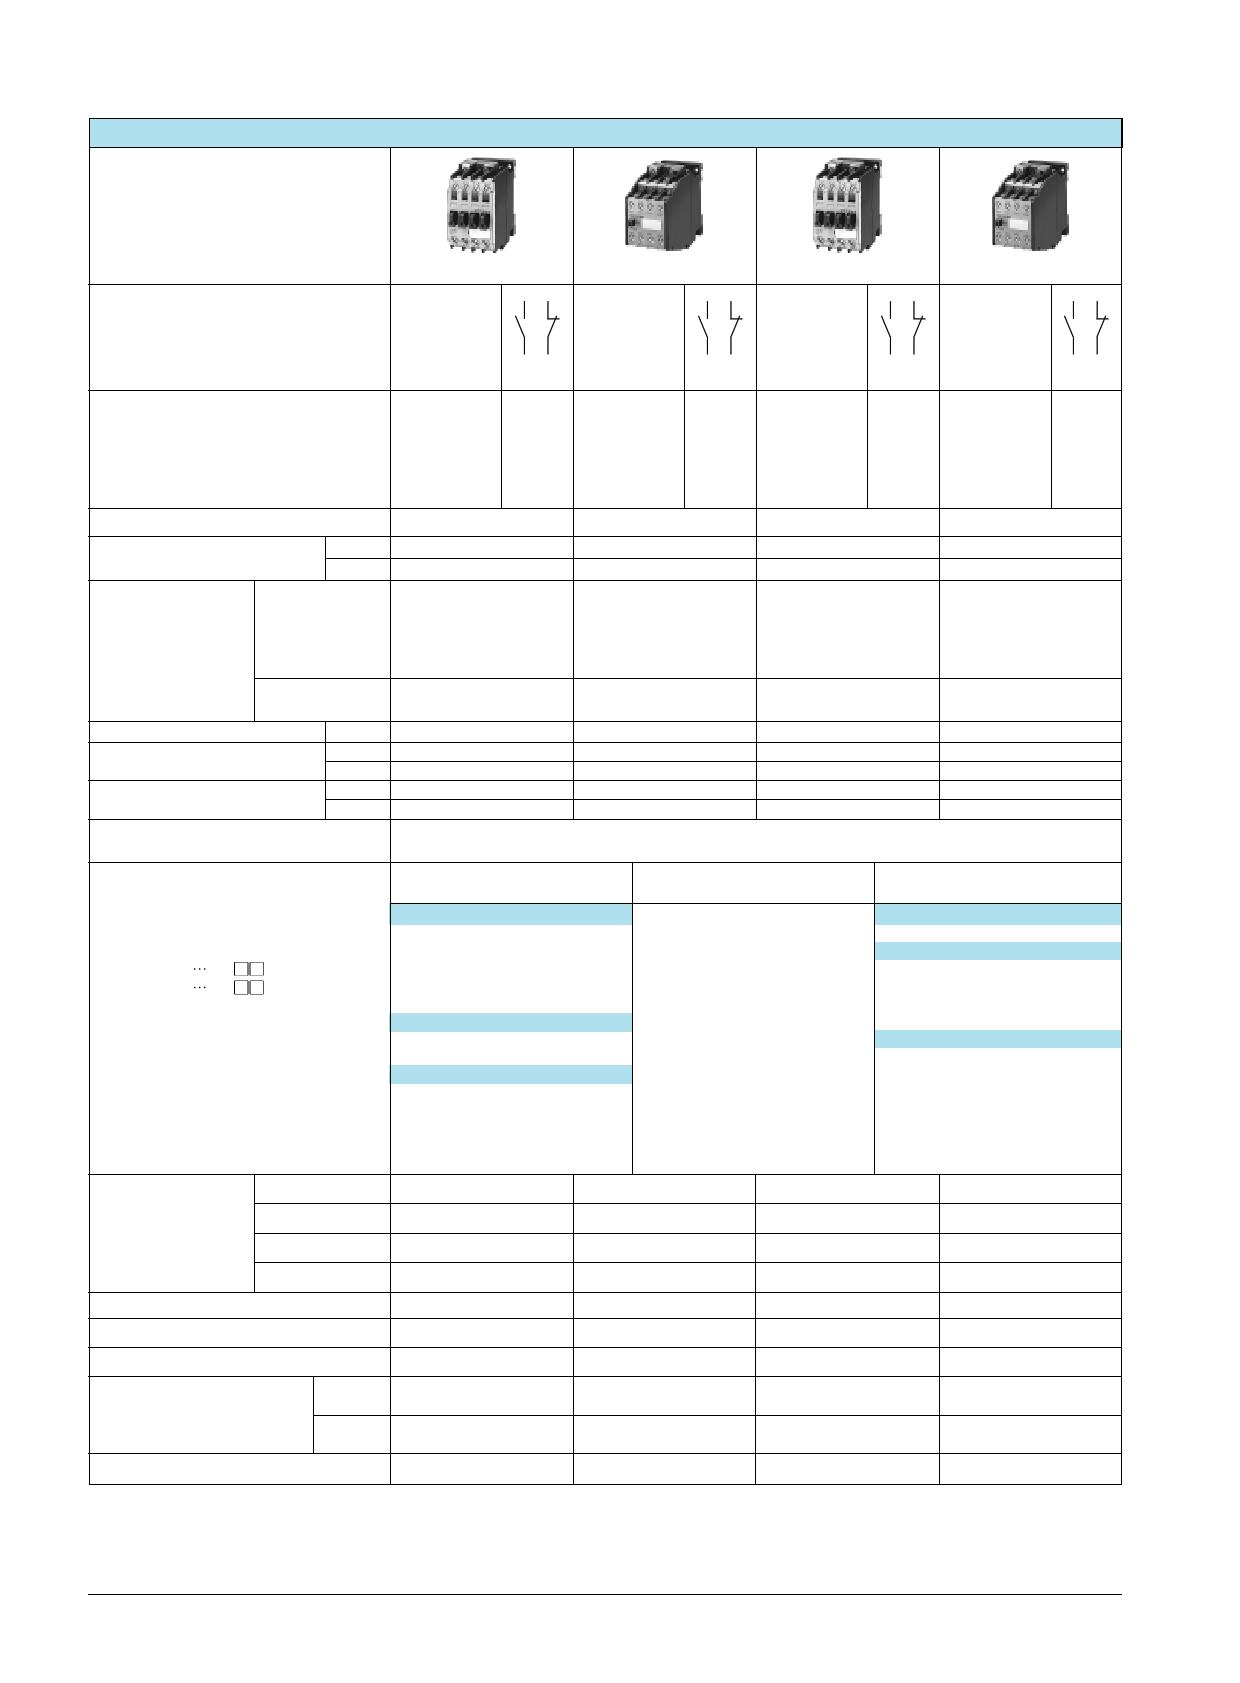 3TF43 Datasheet, 3TF43 PDF,ピン配置, 機能